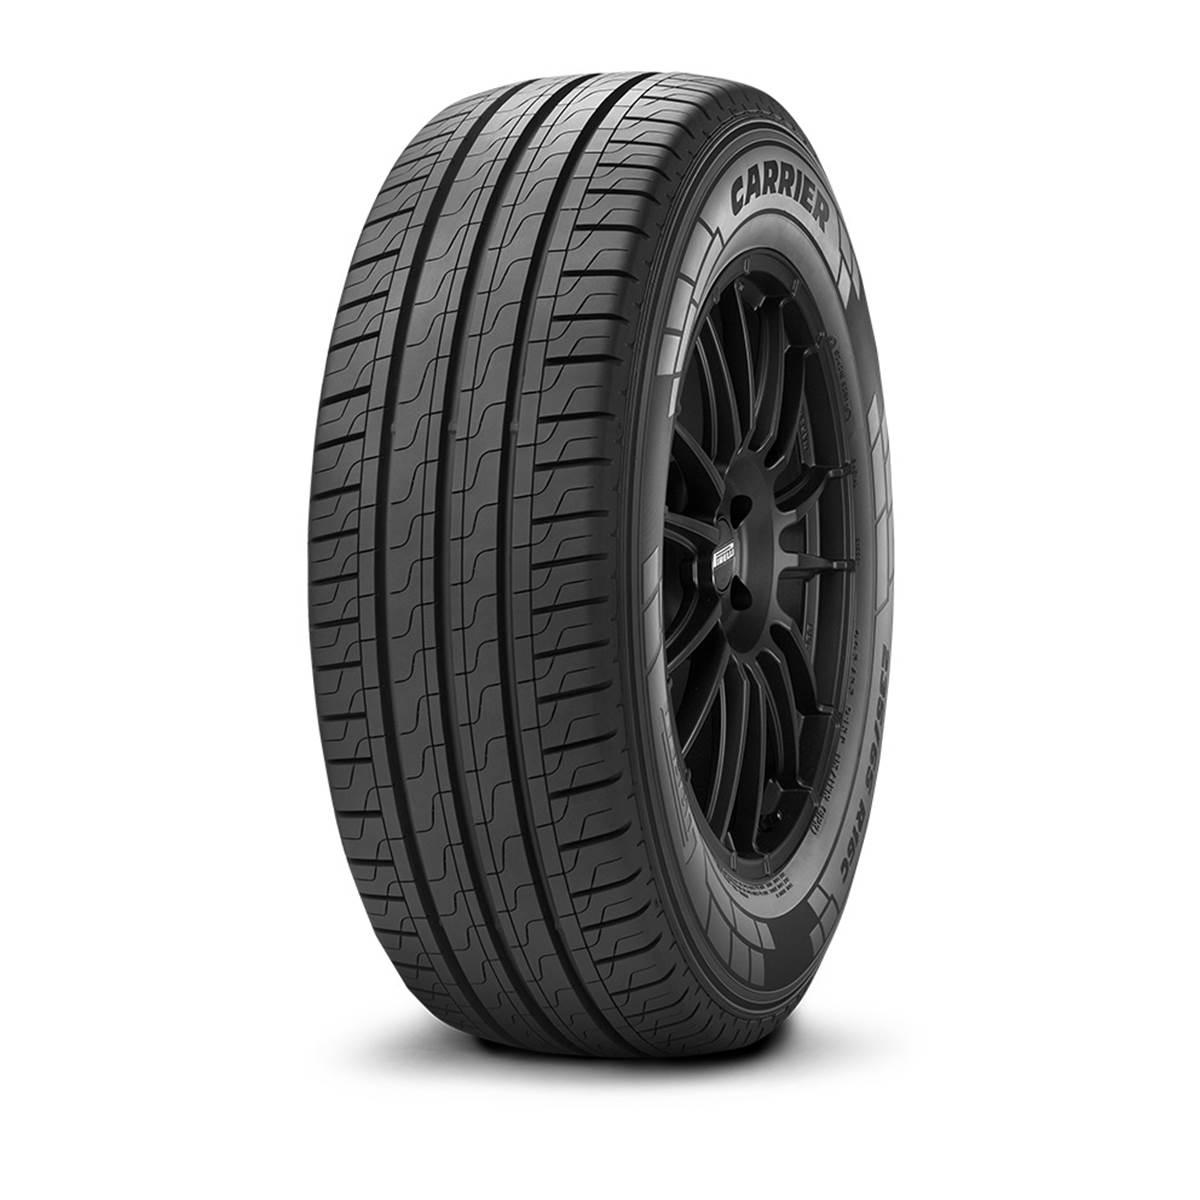 Pneu Camionnette Pirelli 215/75R16 116R Carrier